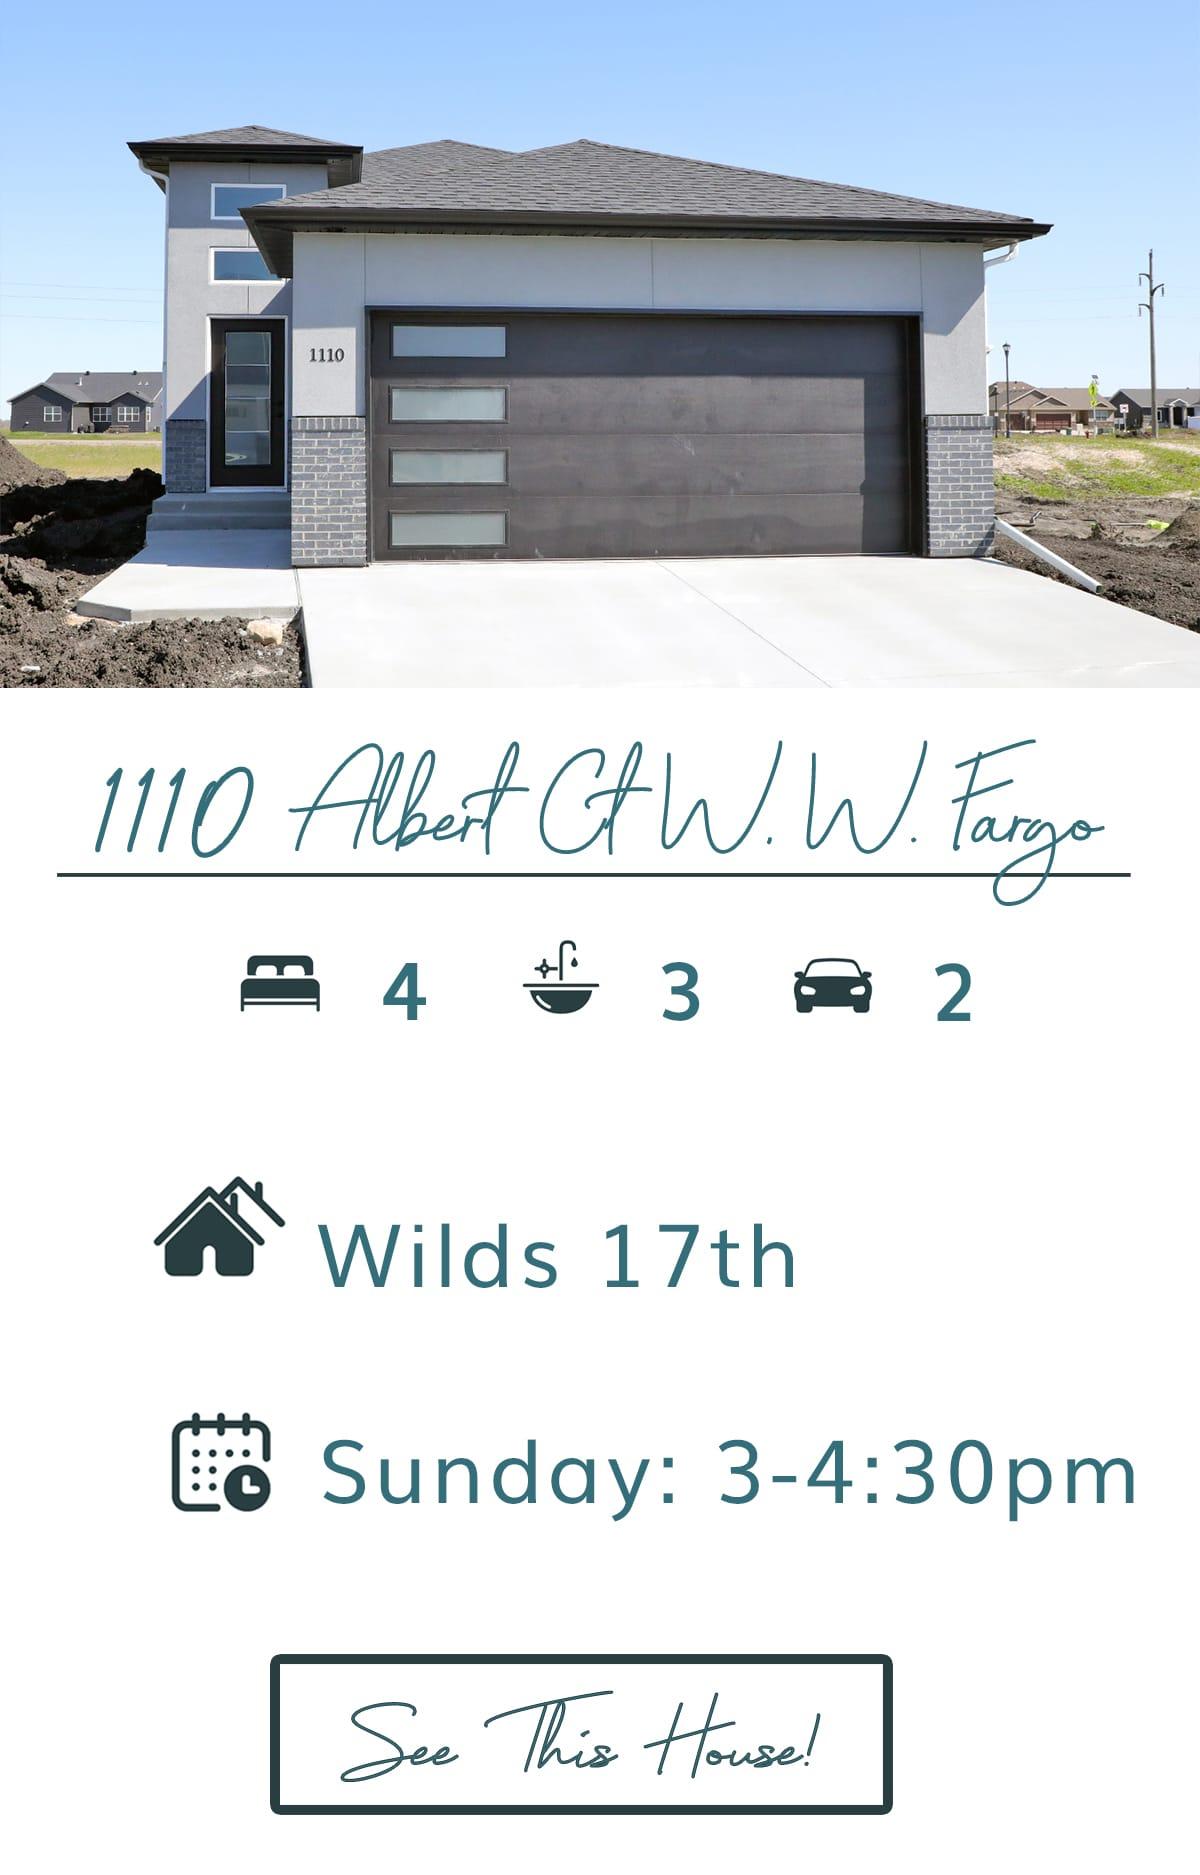 1110 Albert Sunday 2nd